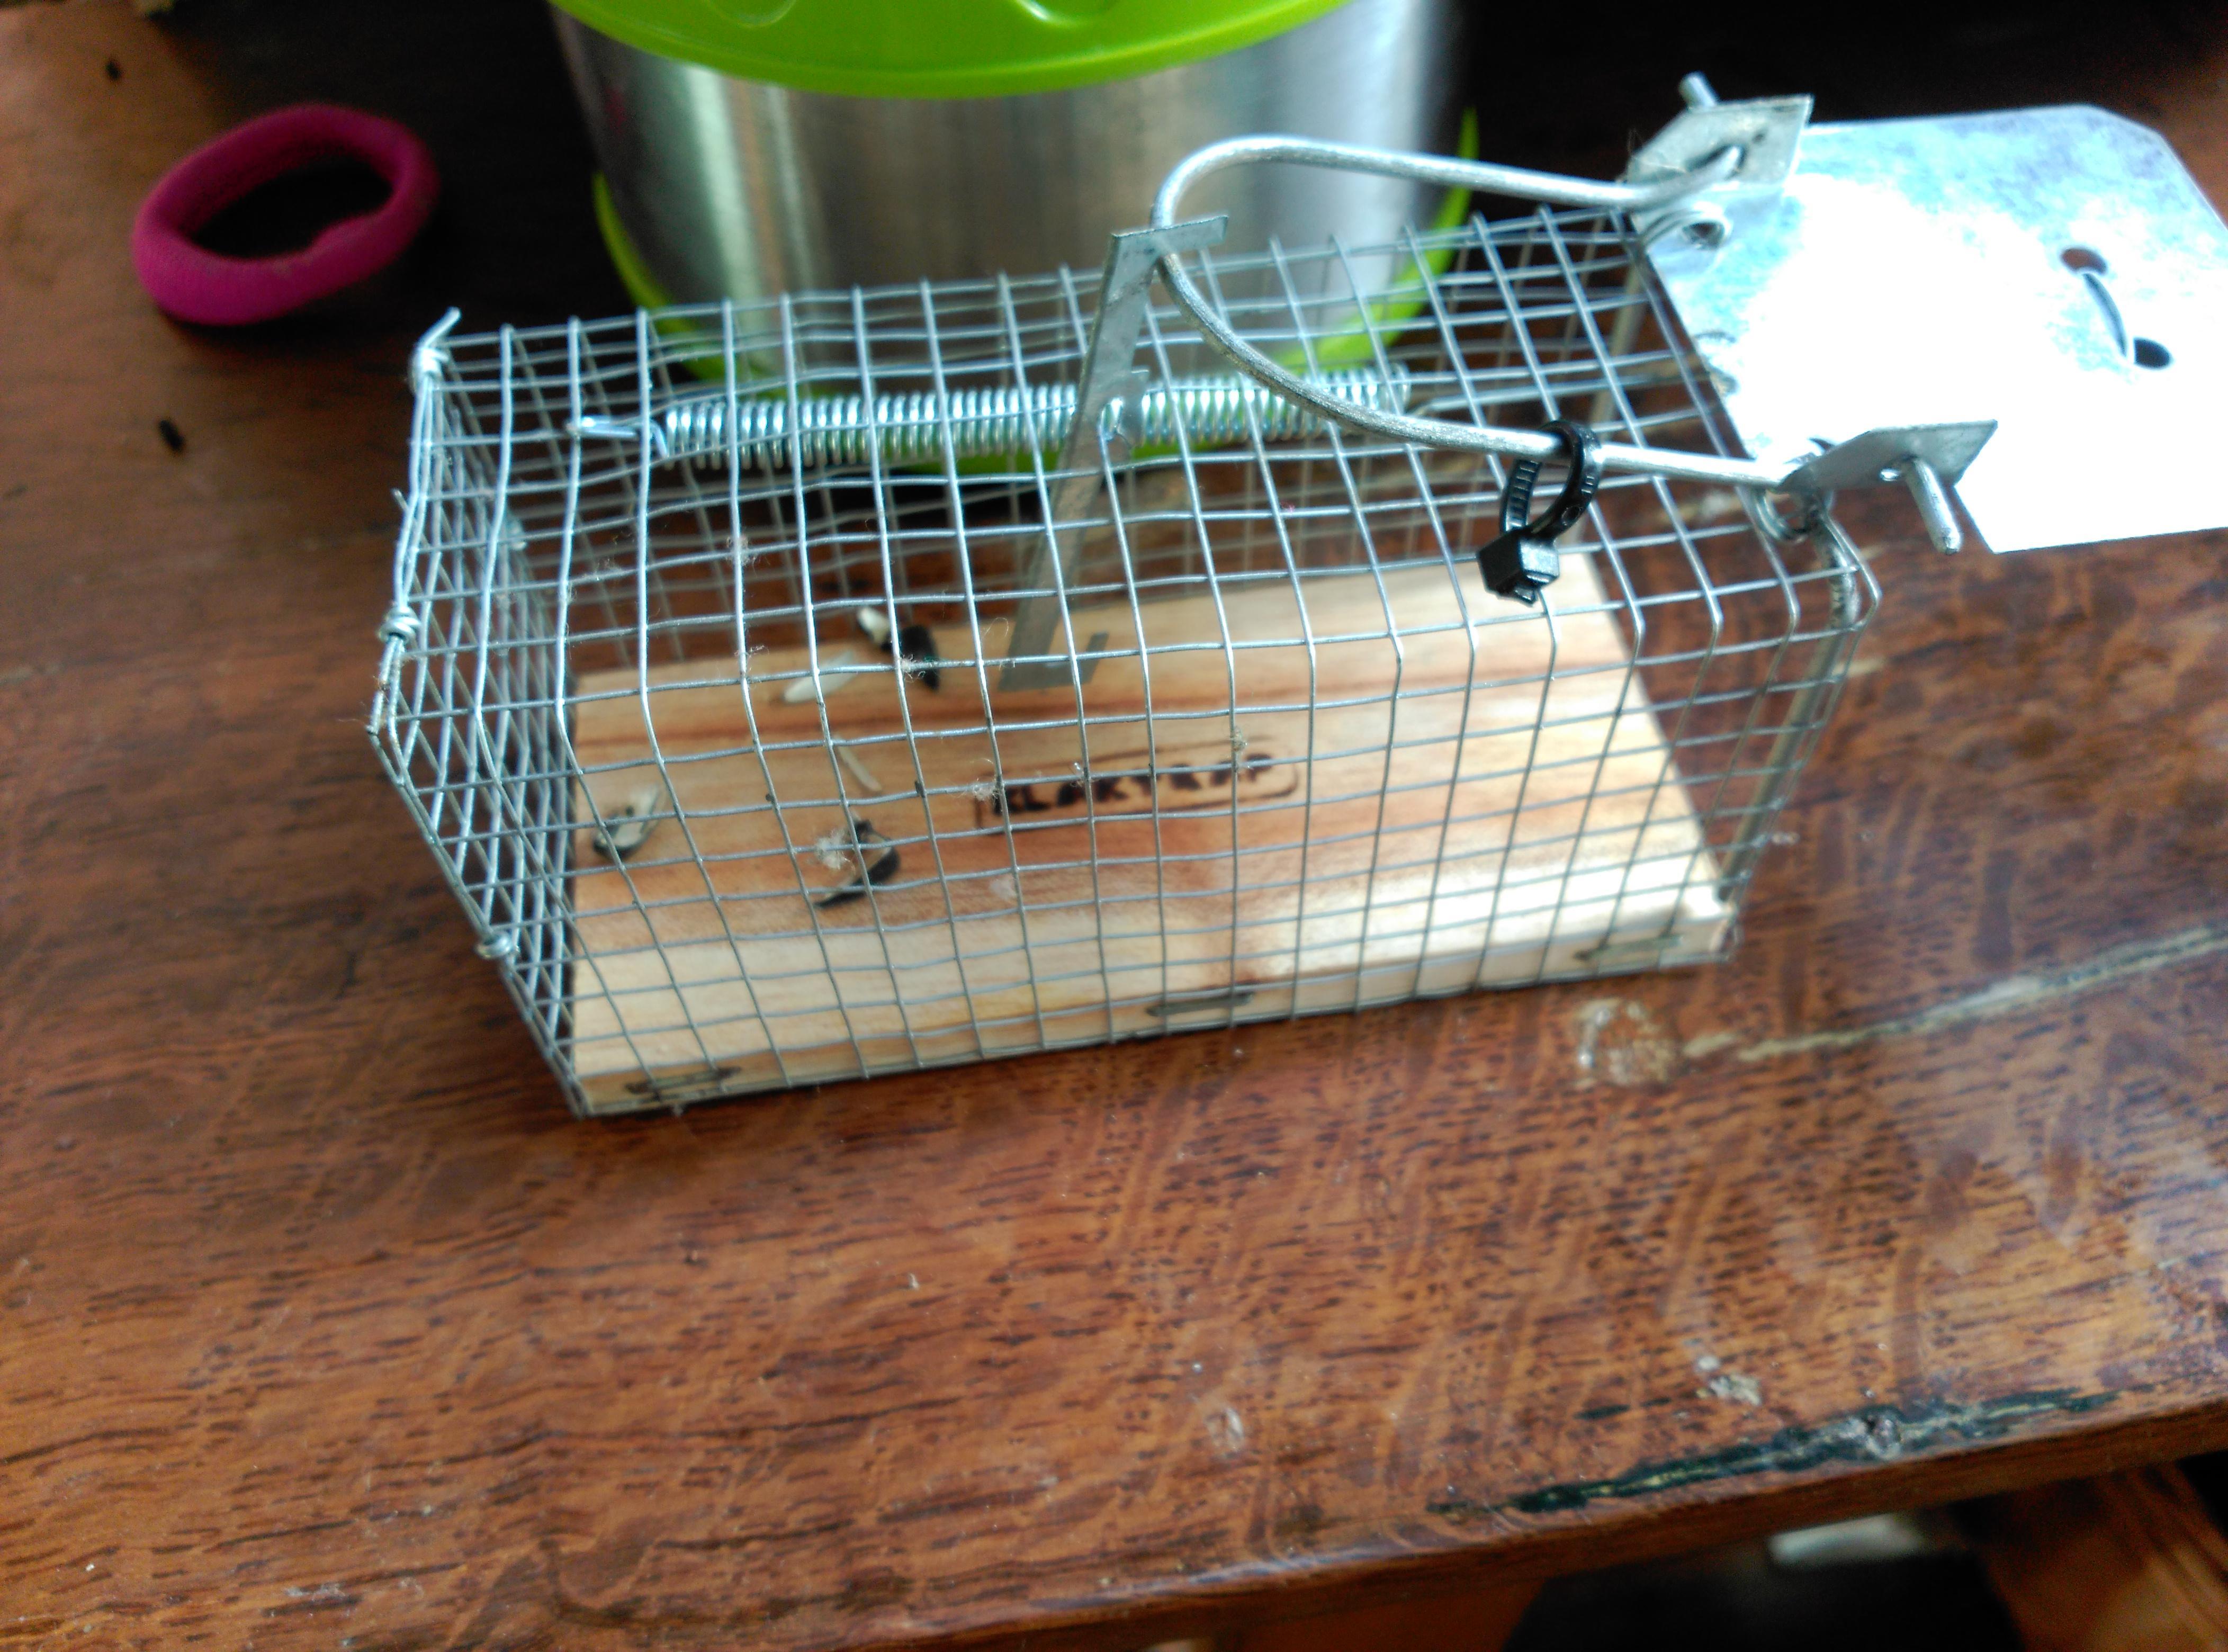 Incre ble negocio ni os en zimbabue venden ratones asados a 1 d lar - Trampas de ratones ...